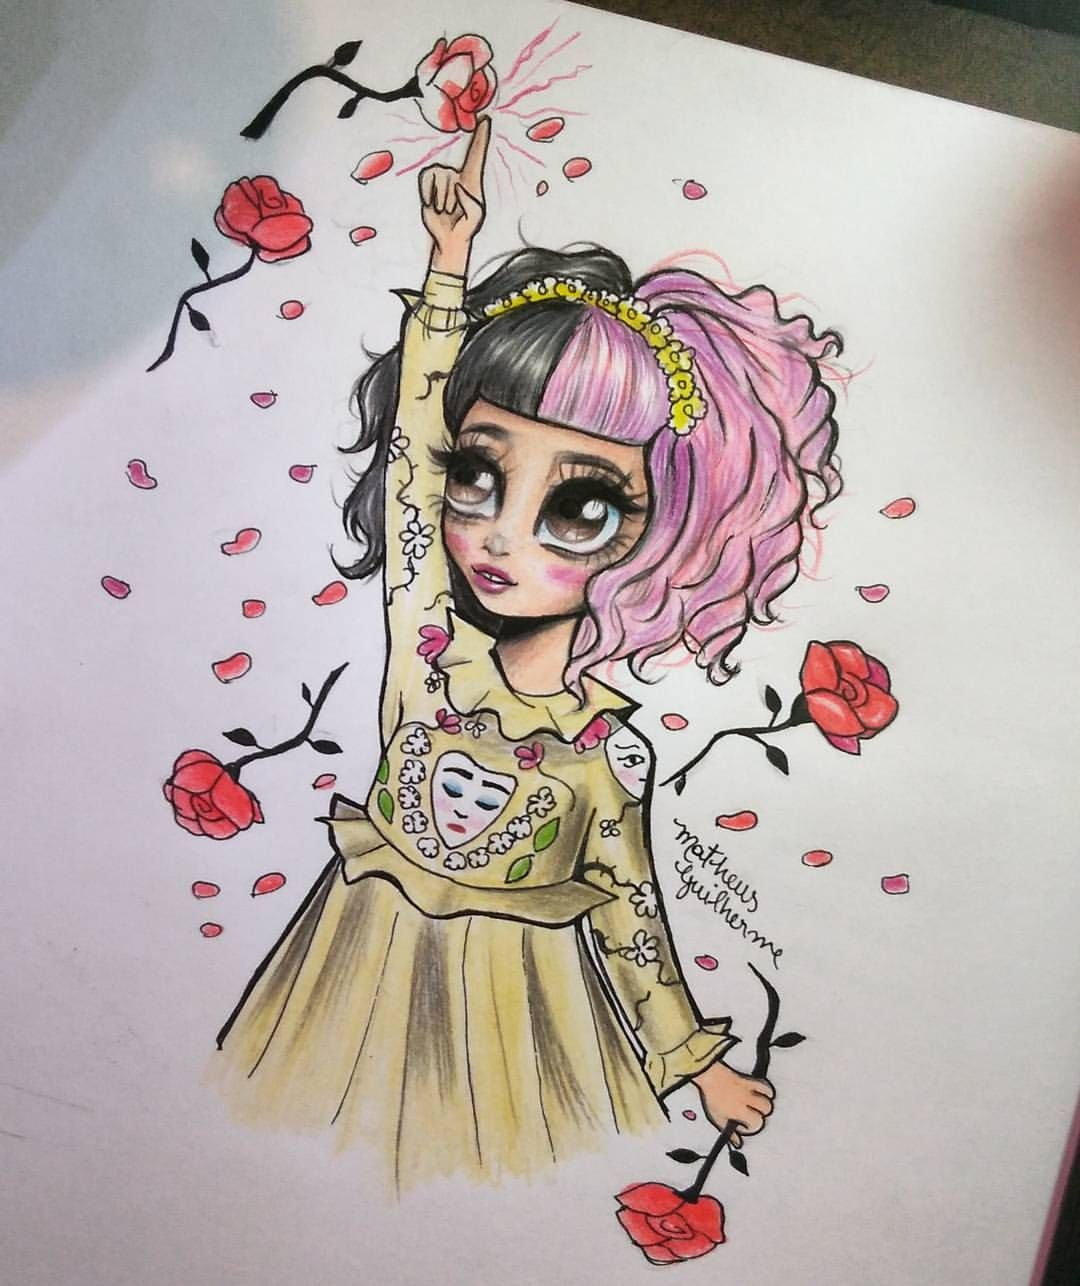 Littlebodybigheart Thank You So Much For 20 1k Muito Obrigado Pelos 20 Melanie Martinez Drawings Melanie Martinez Mad Hatter Melanie Martinez Anime